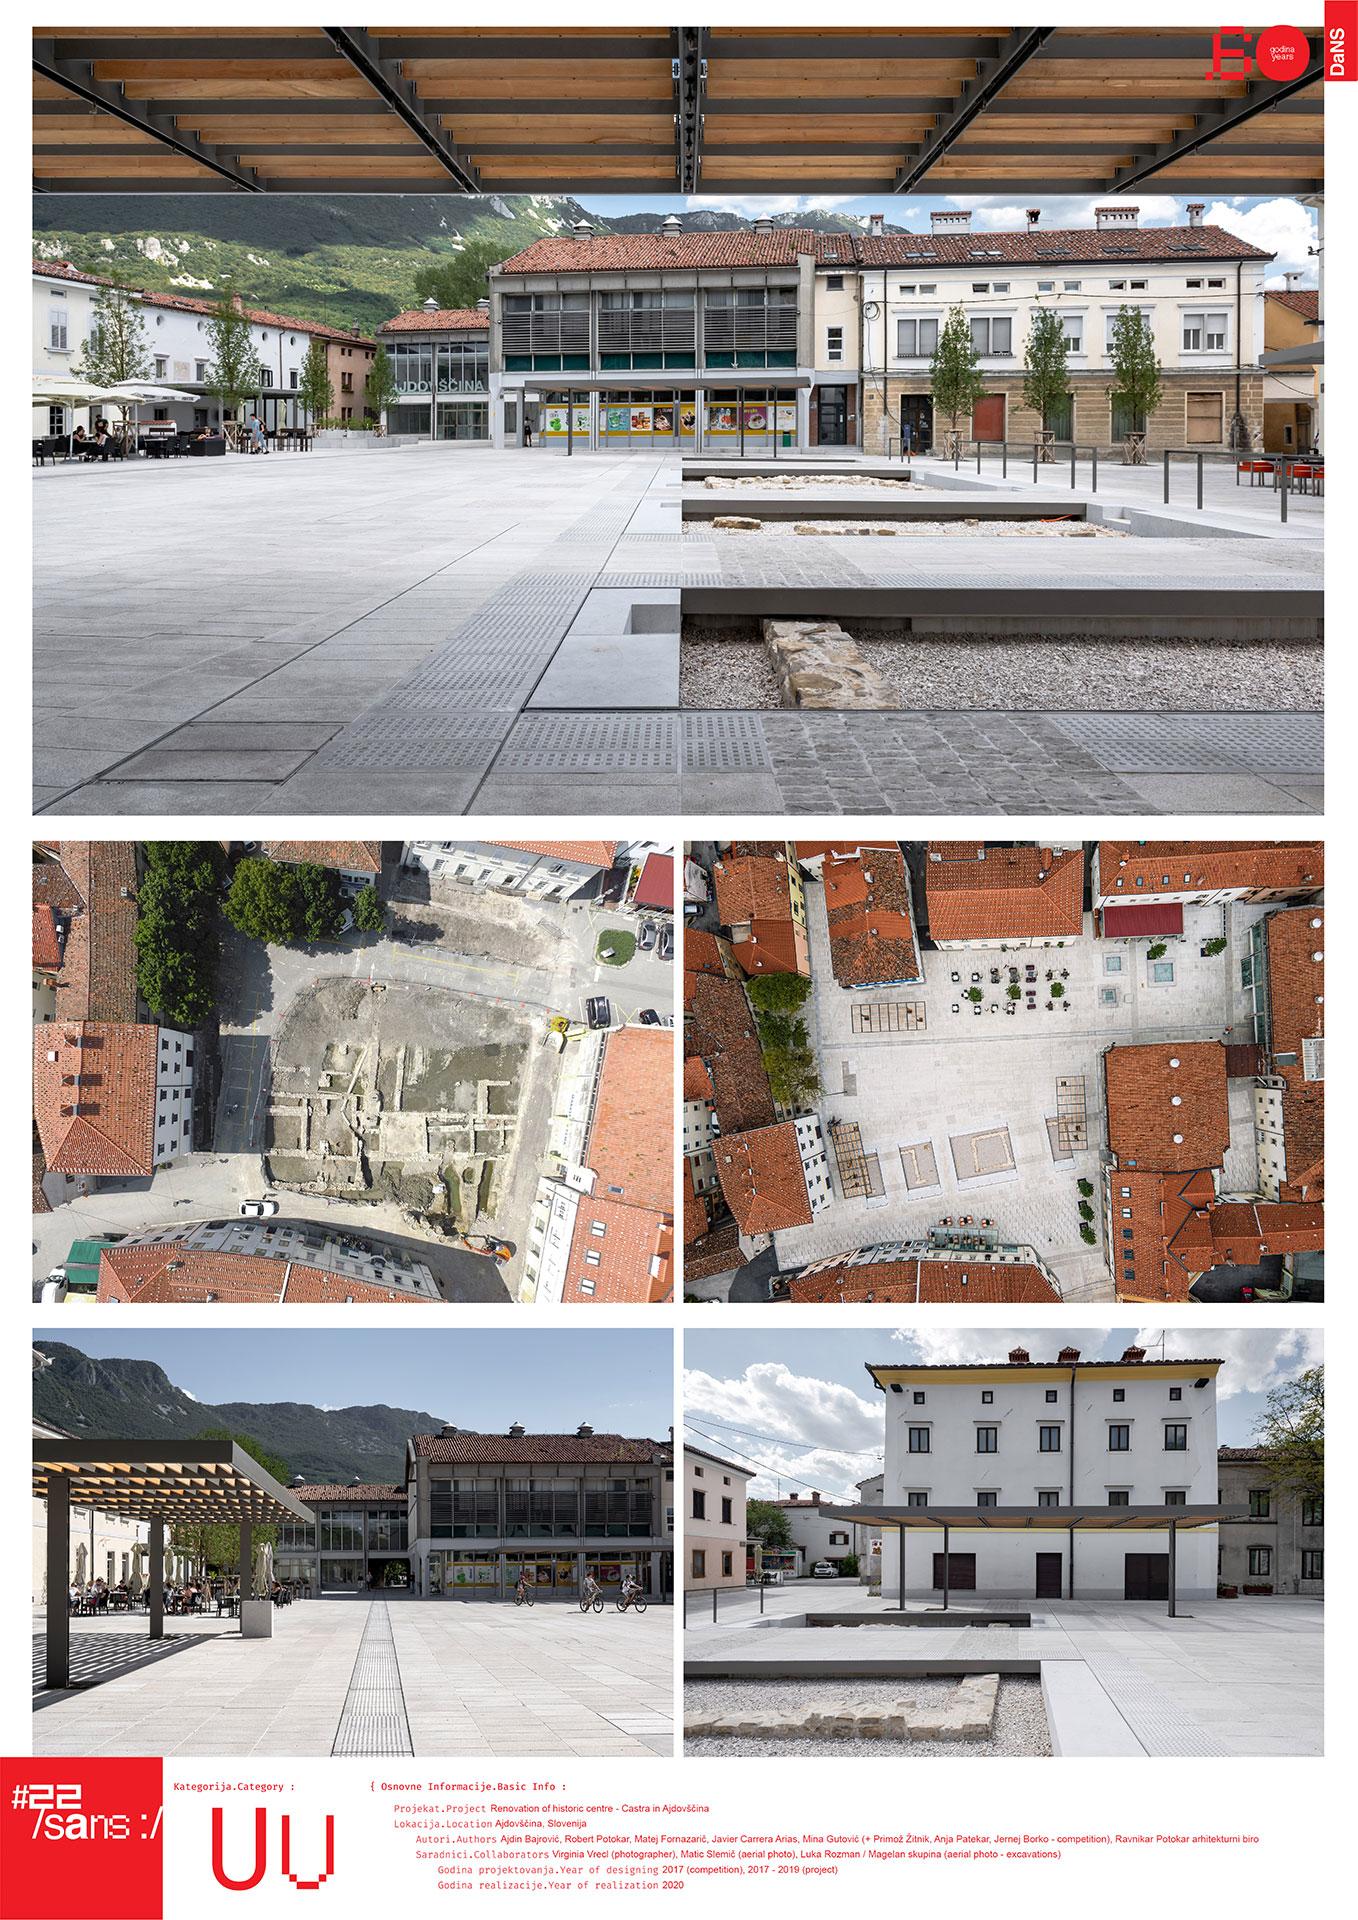 Renovacija istorijskog centra – Kastra u Ajdovšćini // Renovation of the historic centre - Castrain Ajdovščina